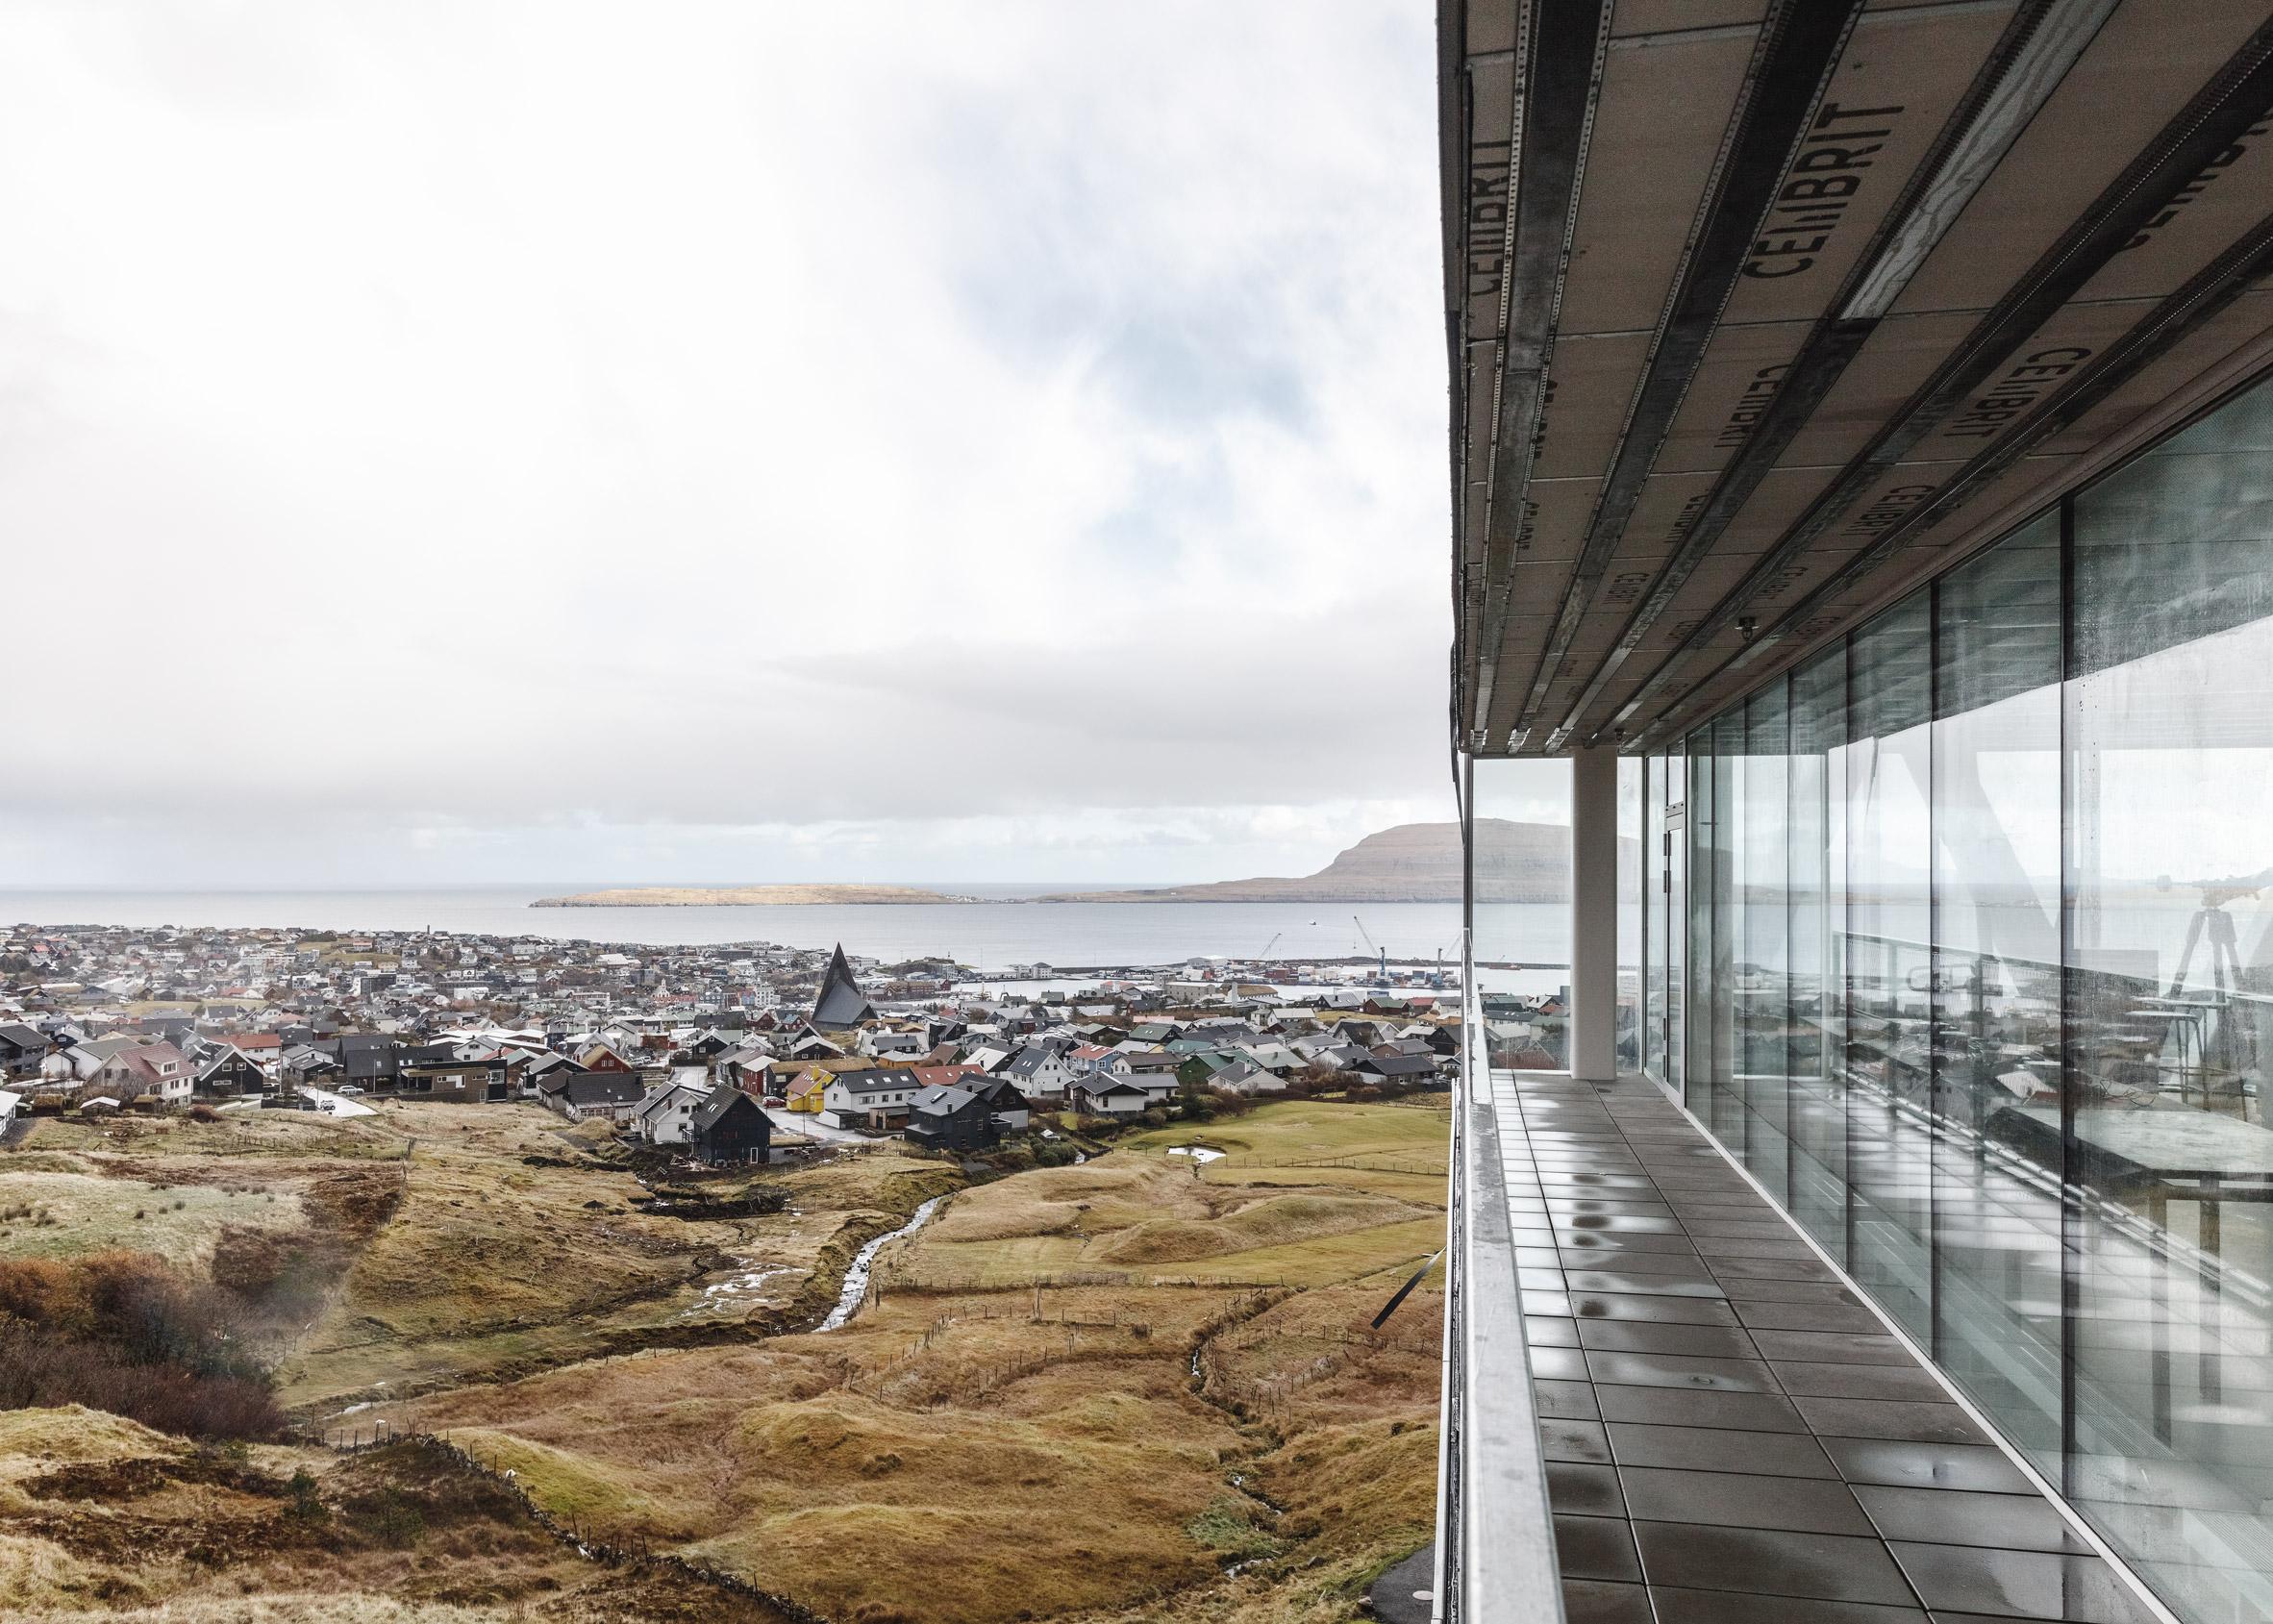 Glasir by BIG in Tórshavn, Faroe Islands